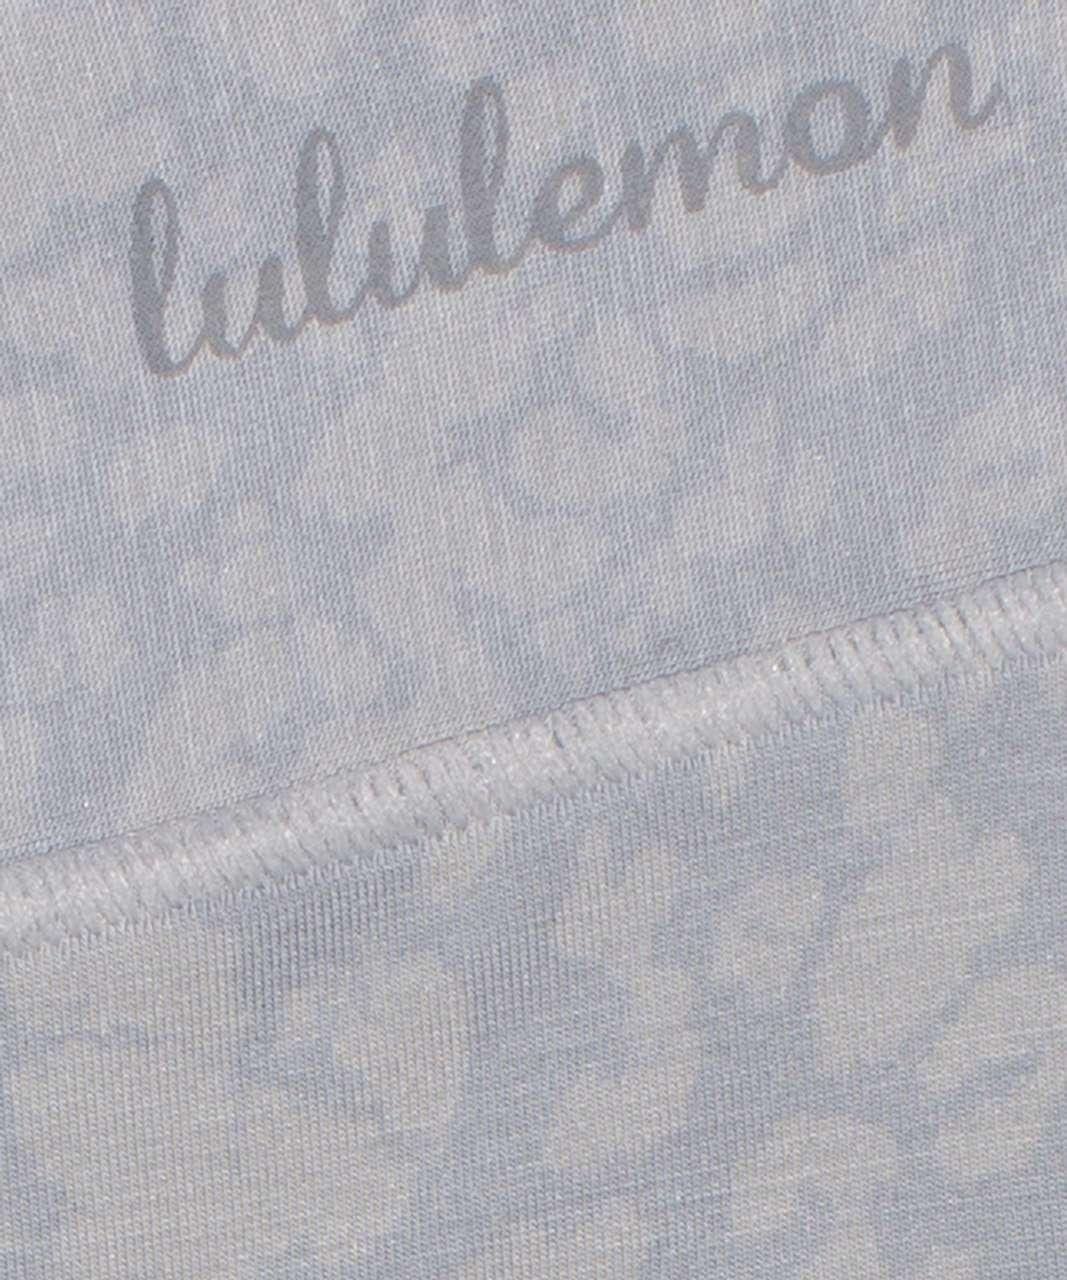 Lululemon Soft Breathable Bikini - Spirited Savannah Silver Drop Rhino Grey